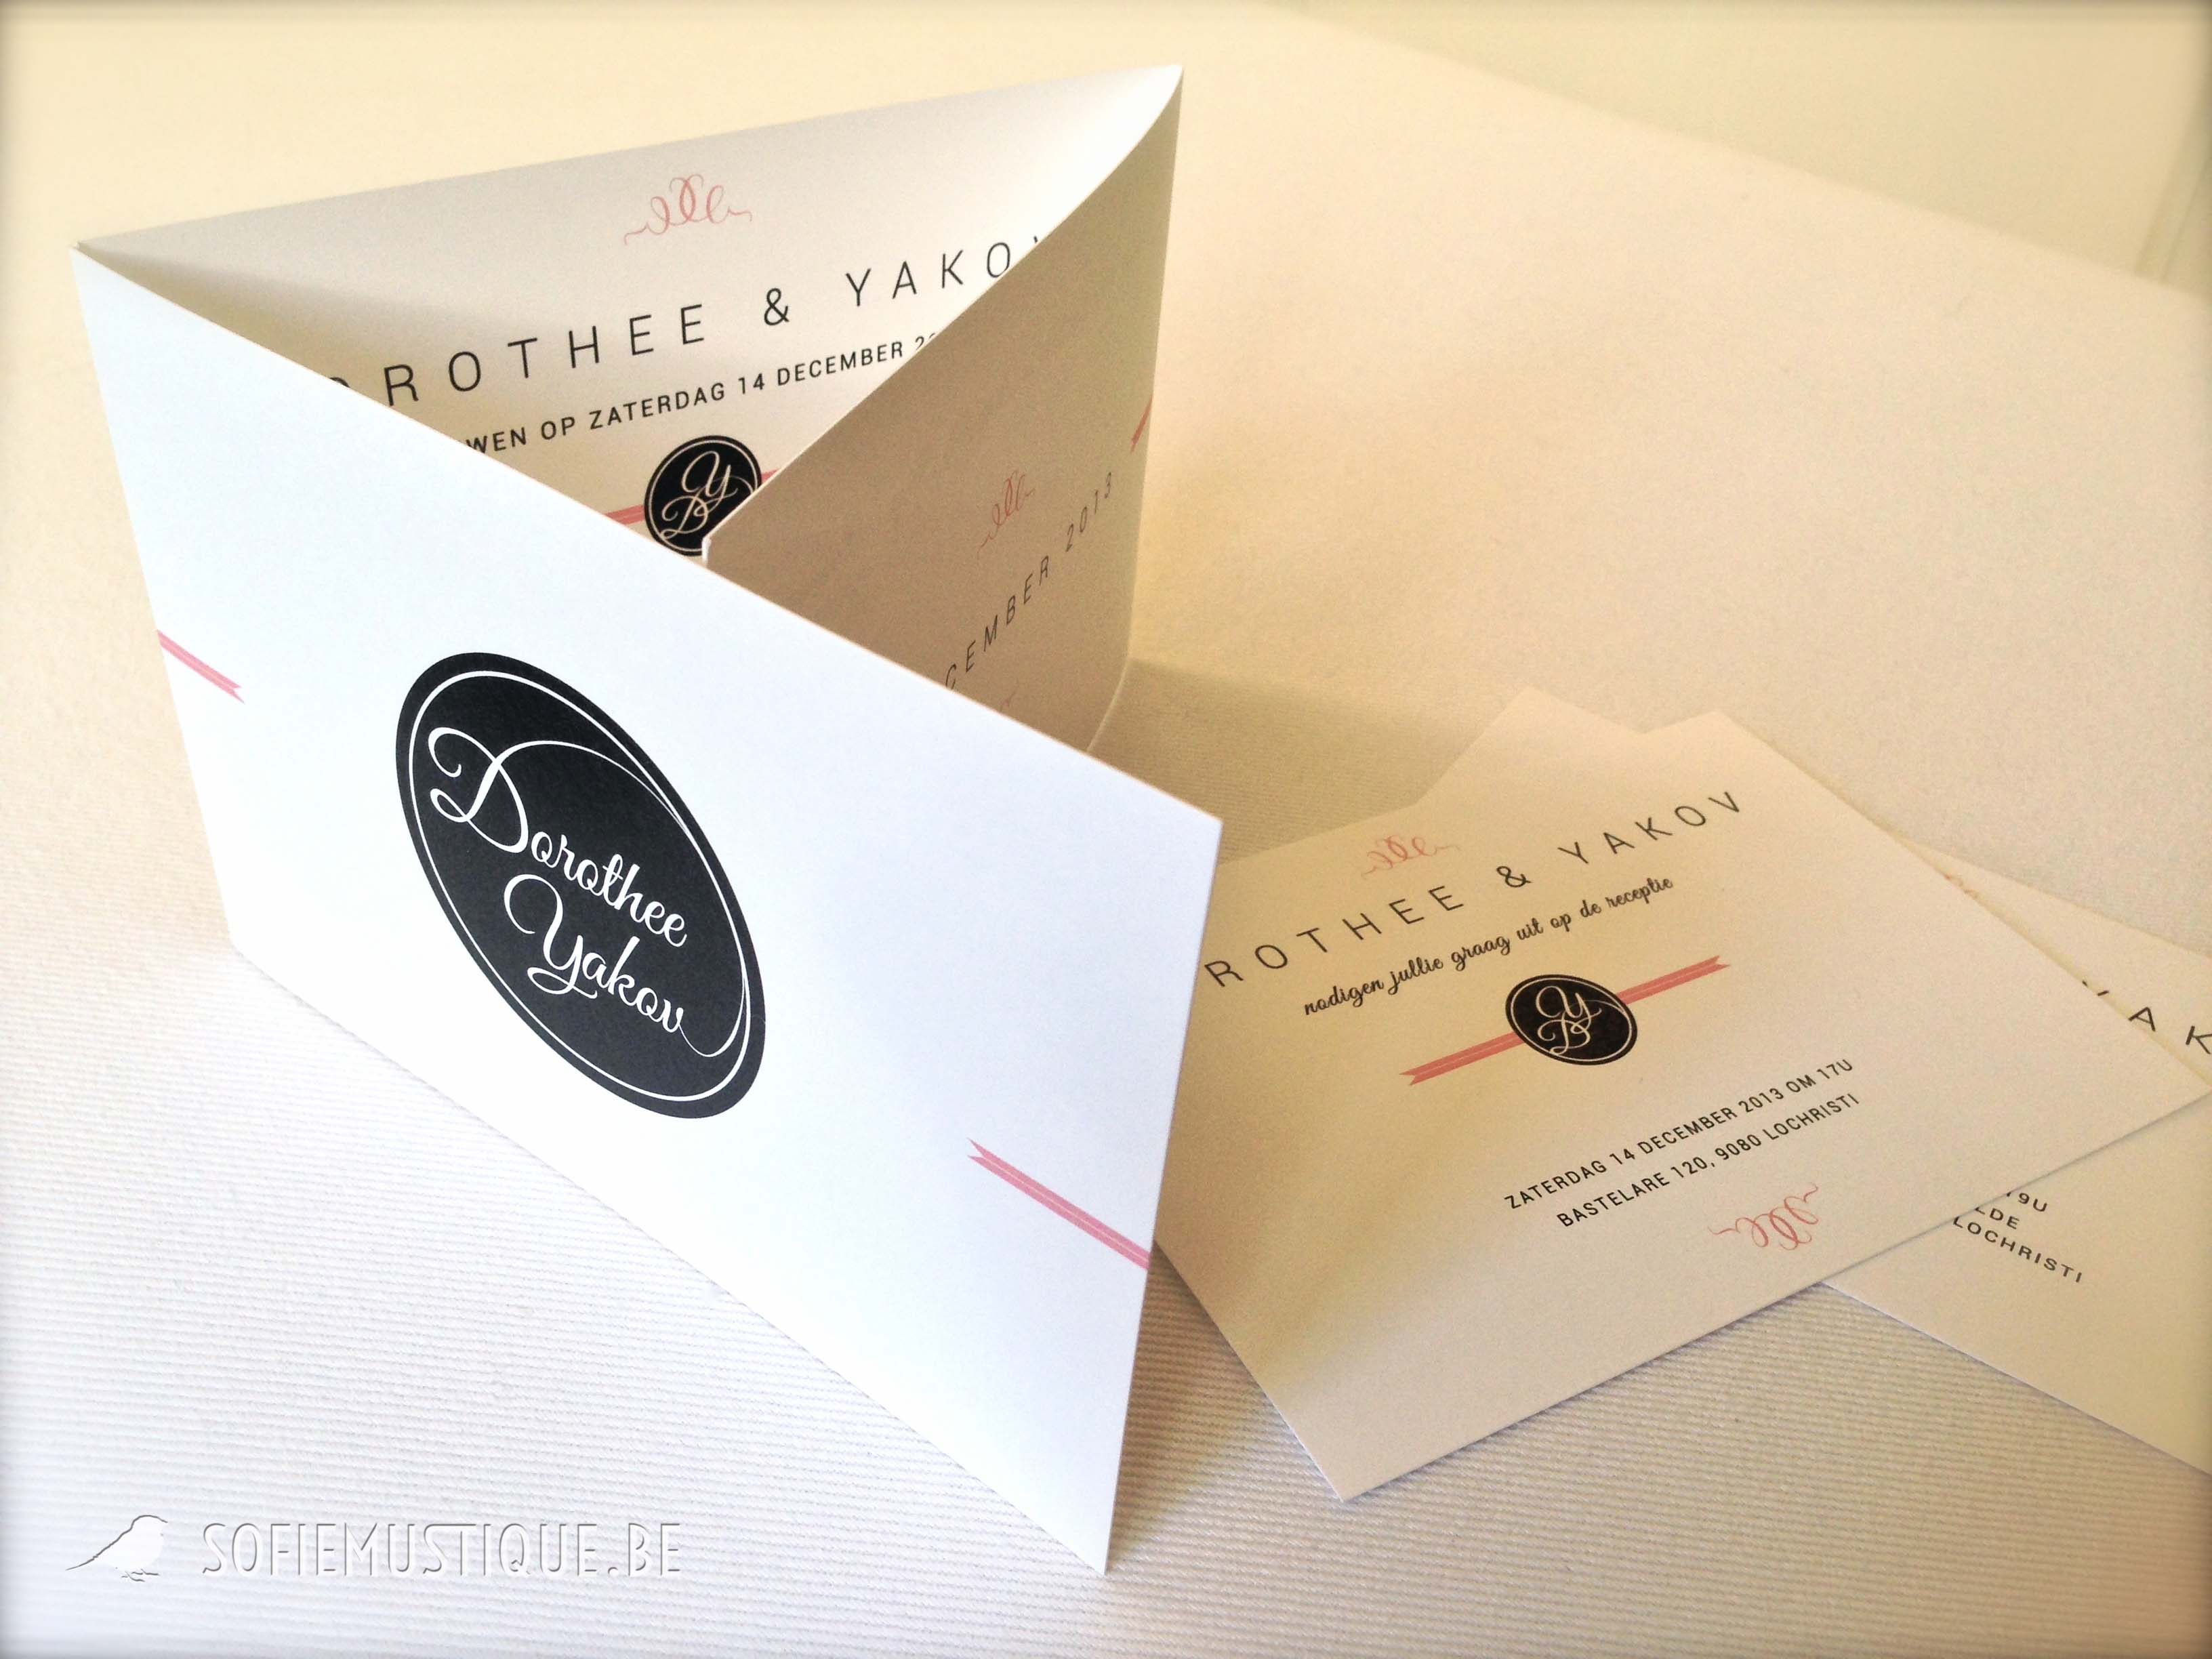 Huwelijksuitnodiging dorothee yakov sofiemustique be